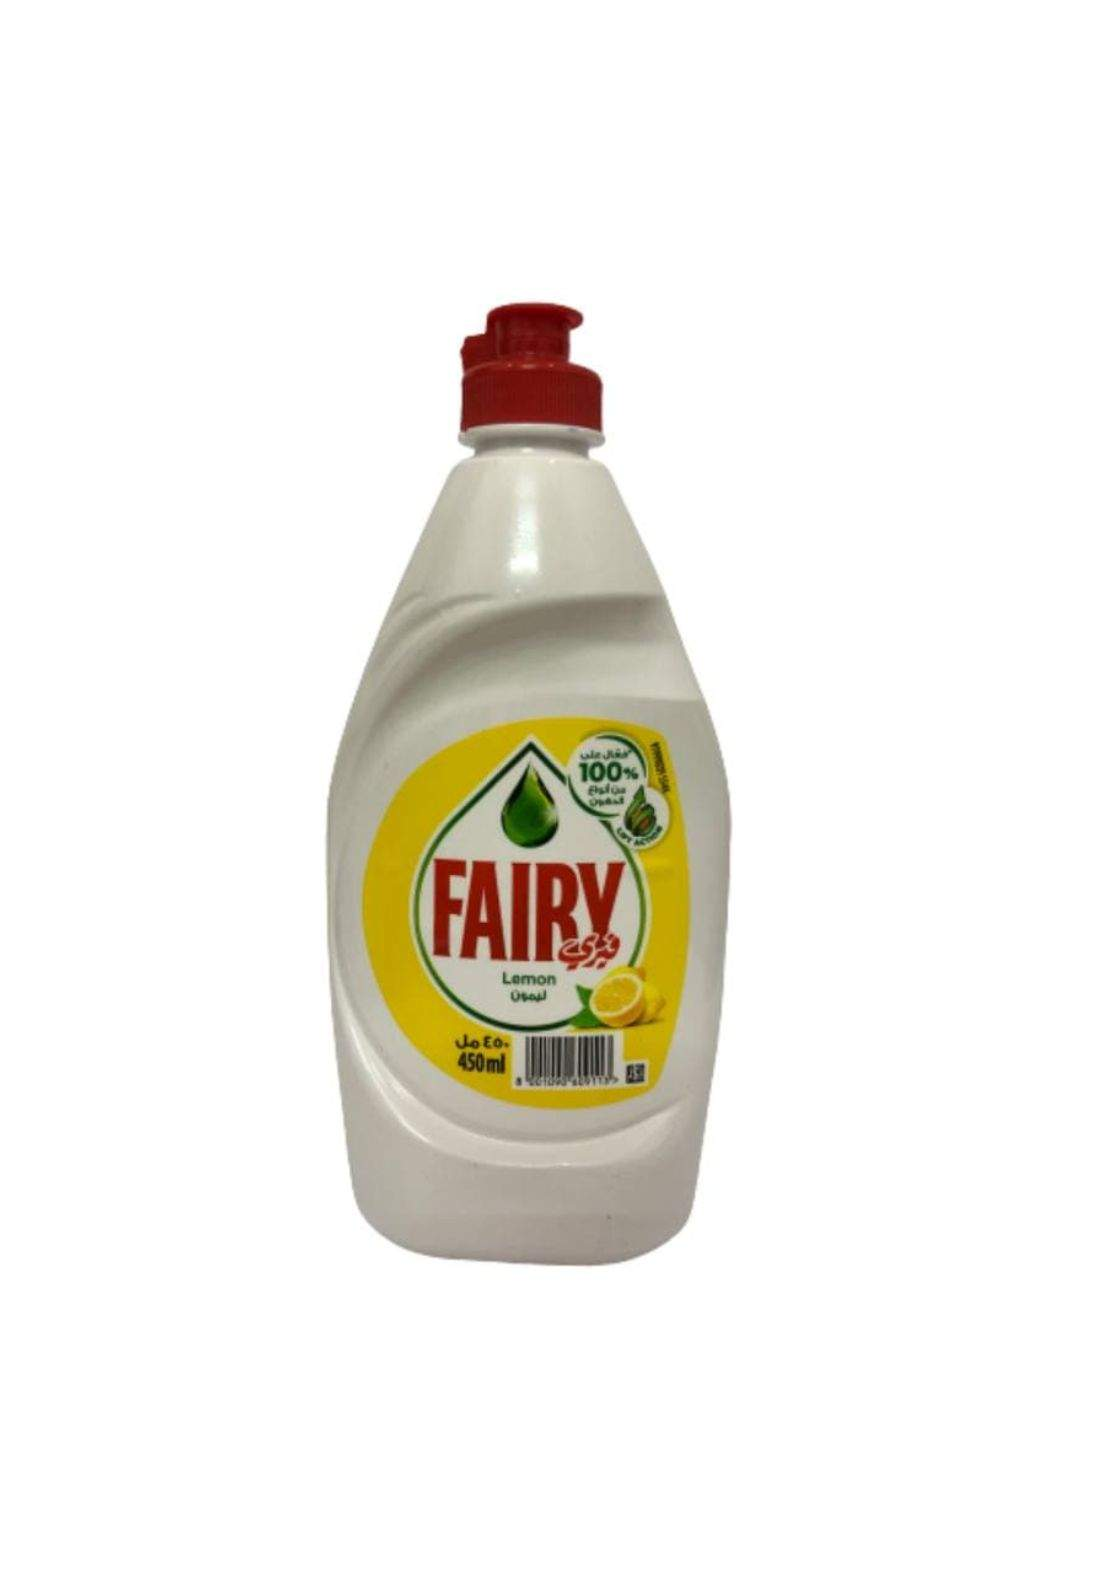 Fairy Dishwashing liquid450ml فيري سائل التنظيف الاواني